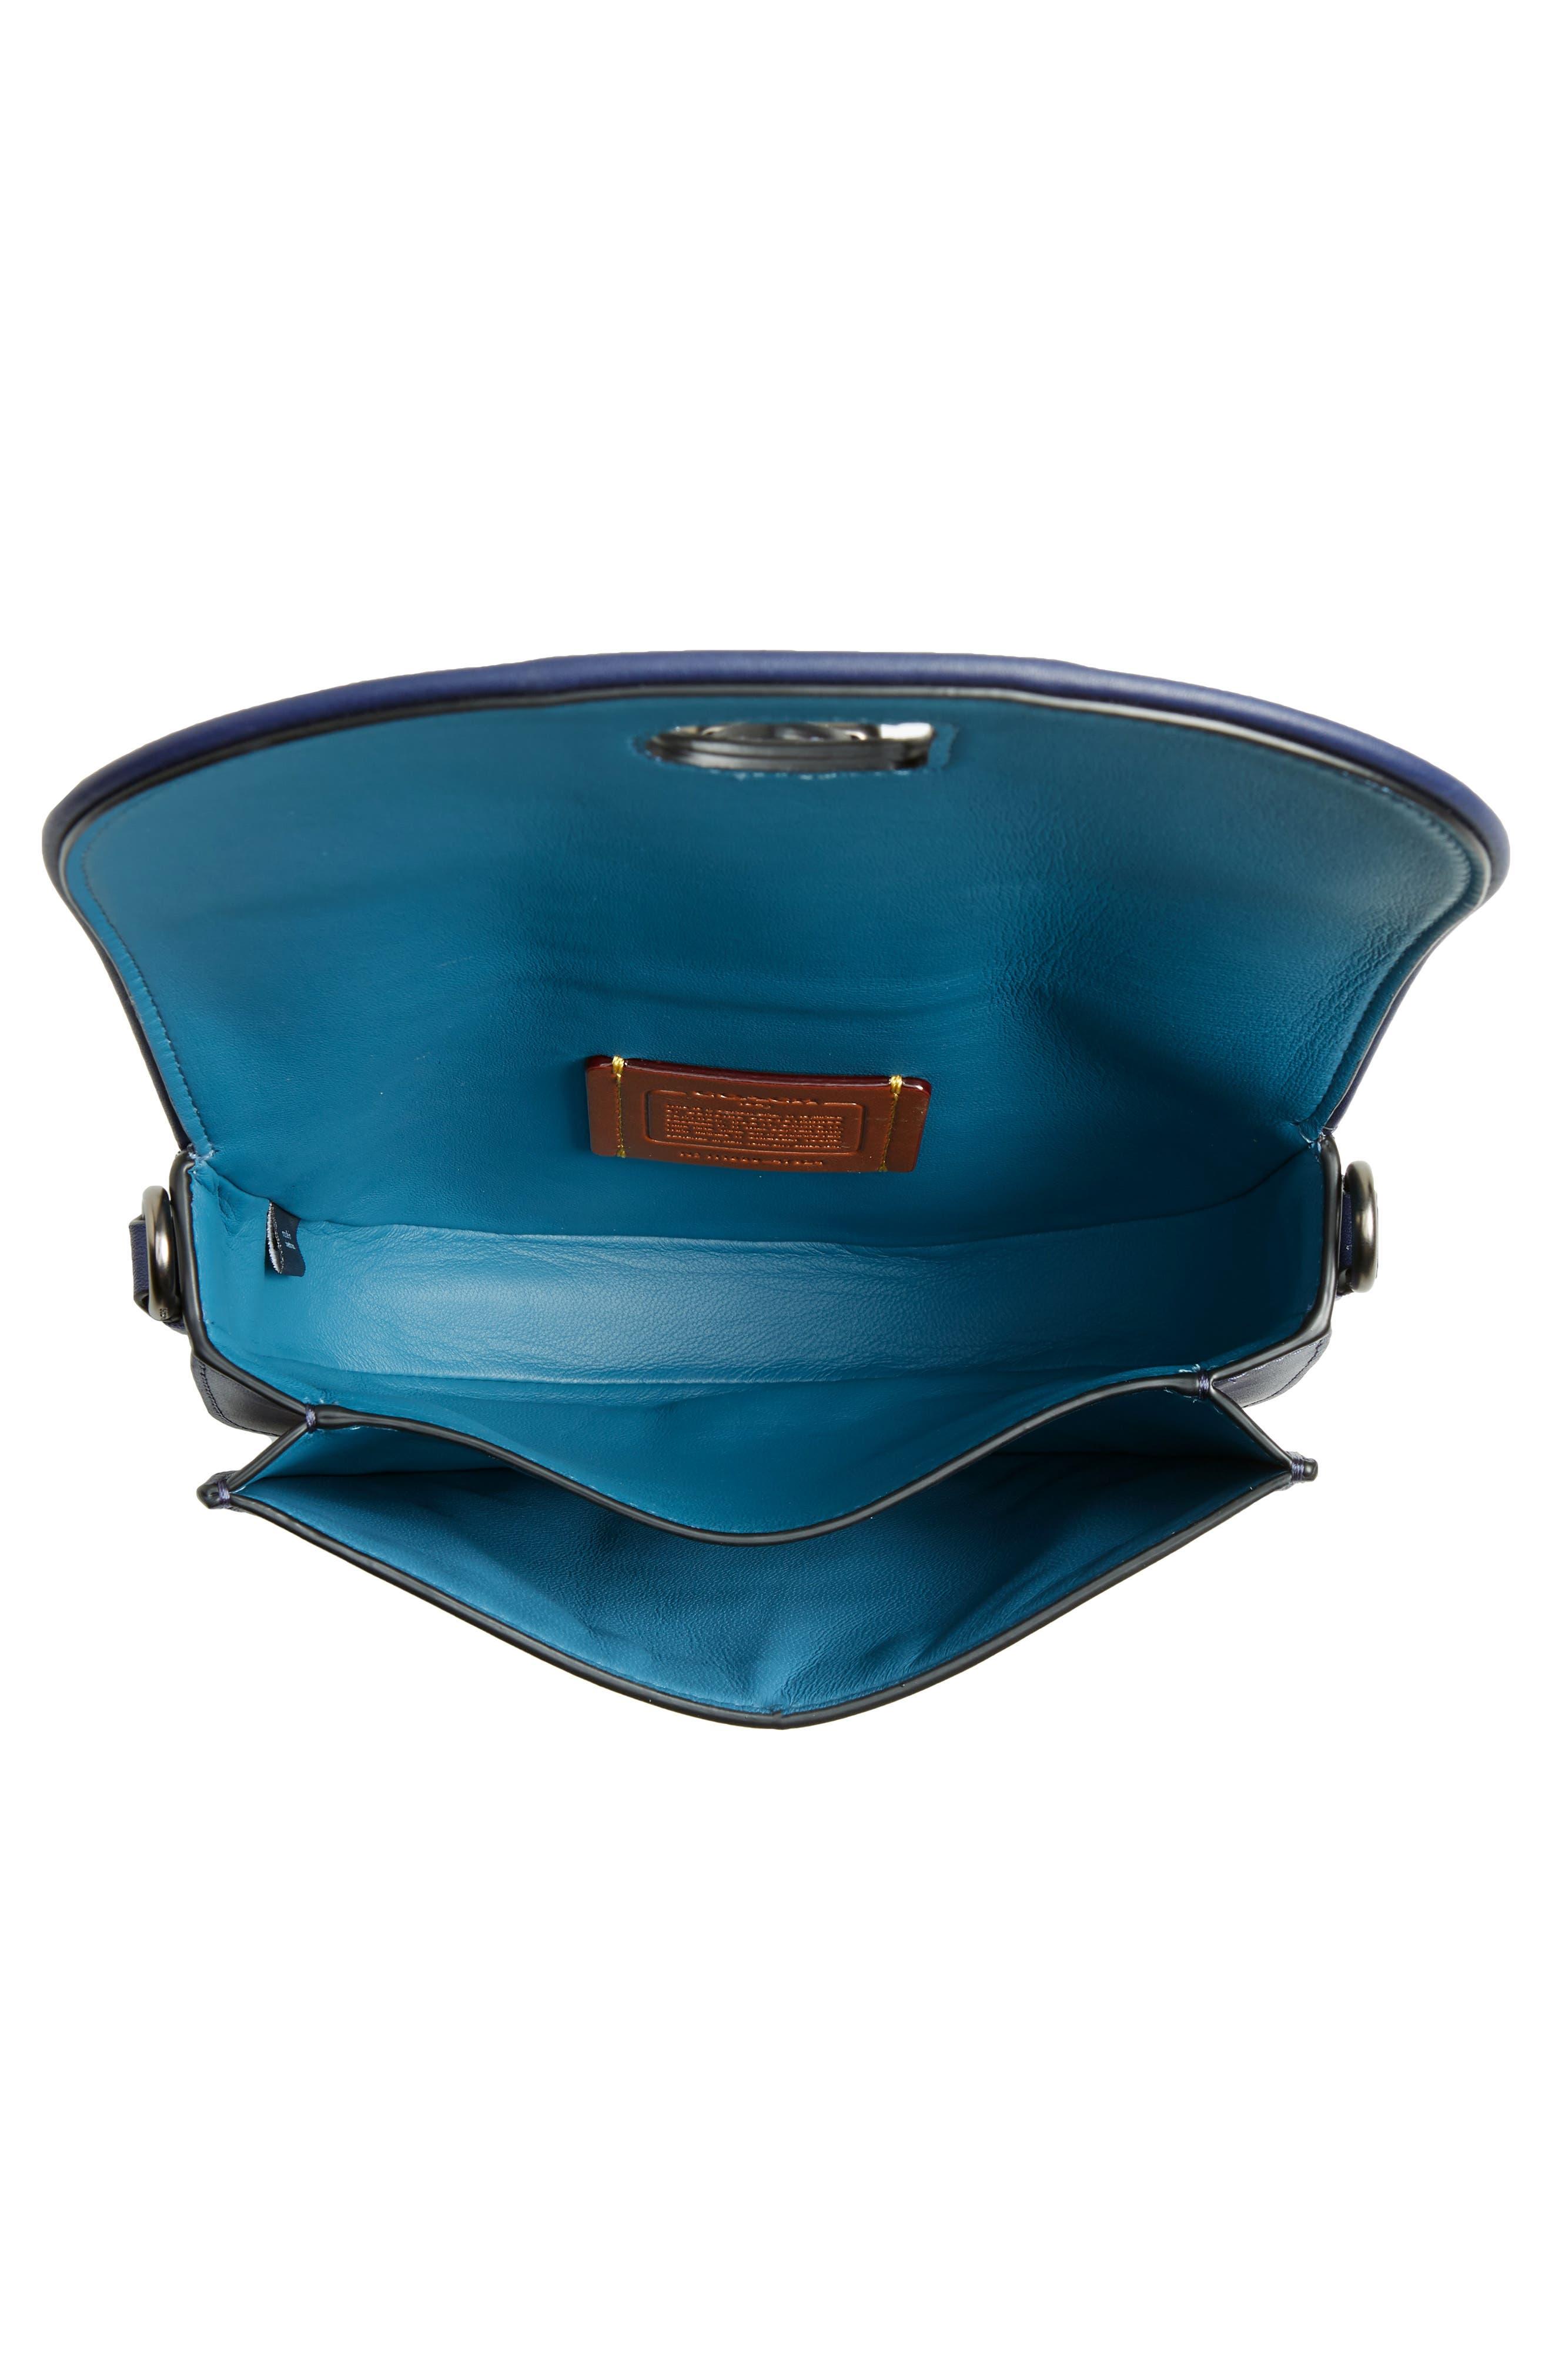 COACH, Saddle 20 Leather Saddle Bag, Alternate thumbnail 5, color, CADET